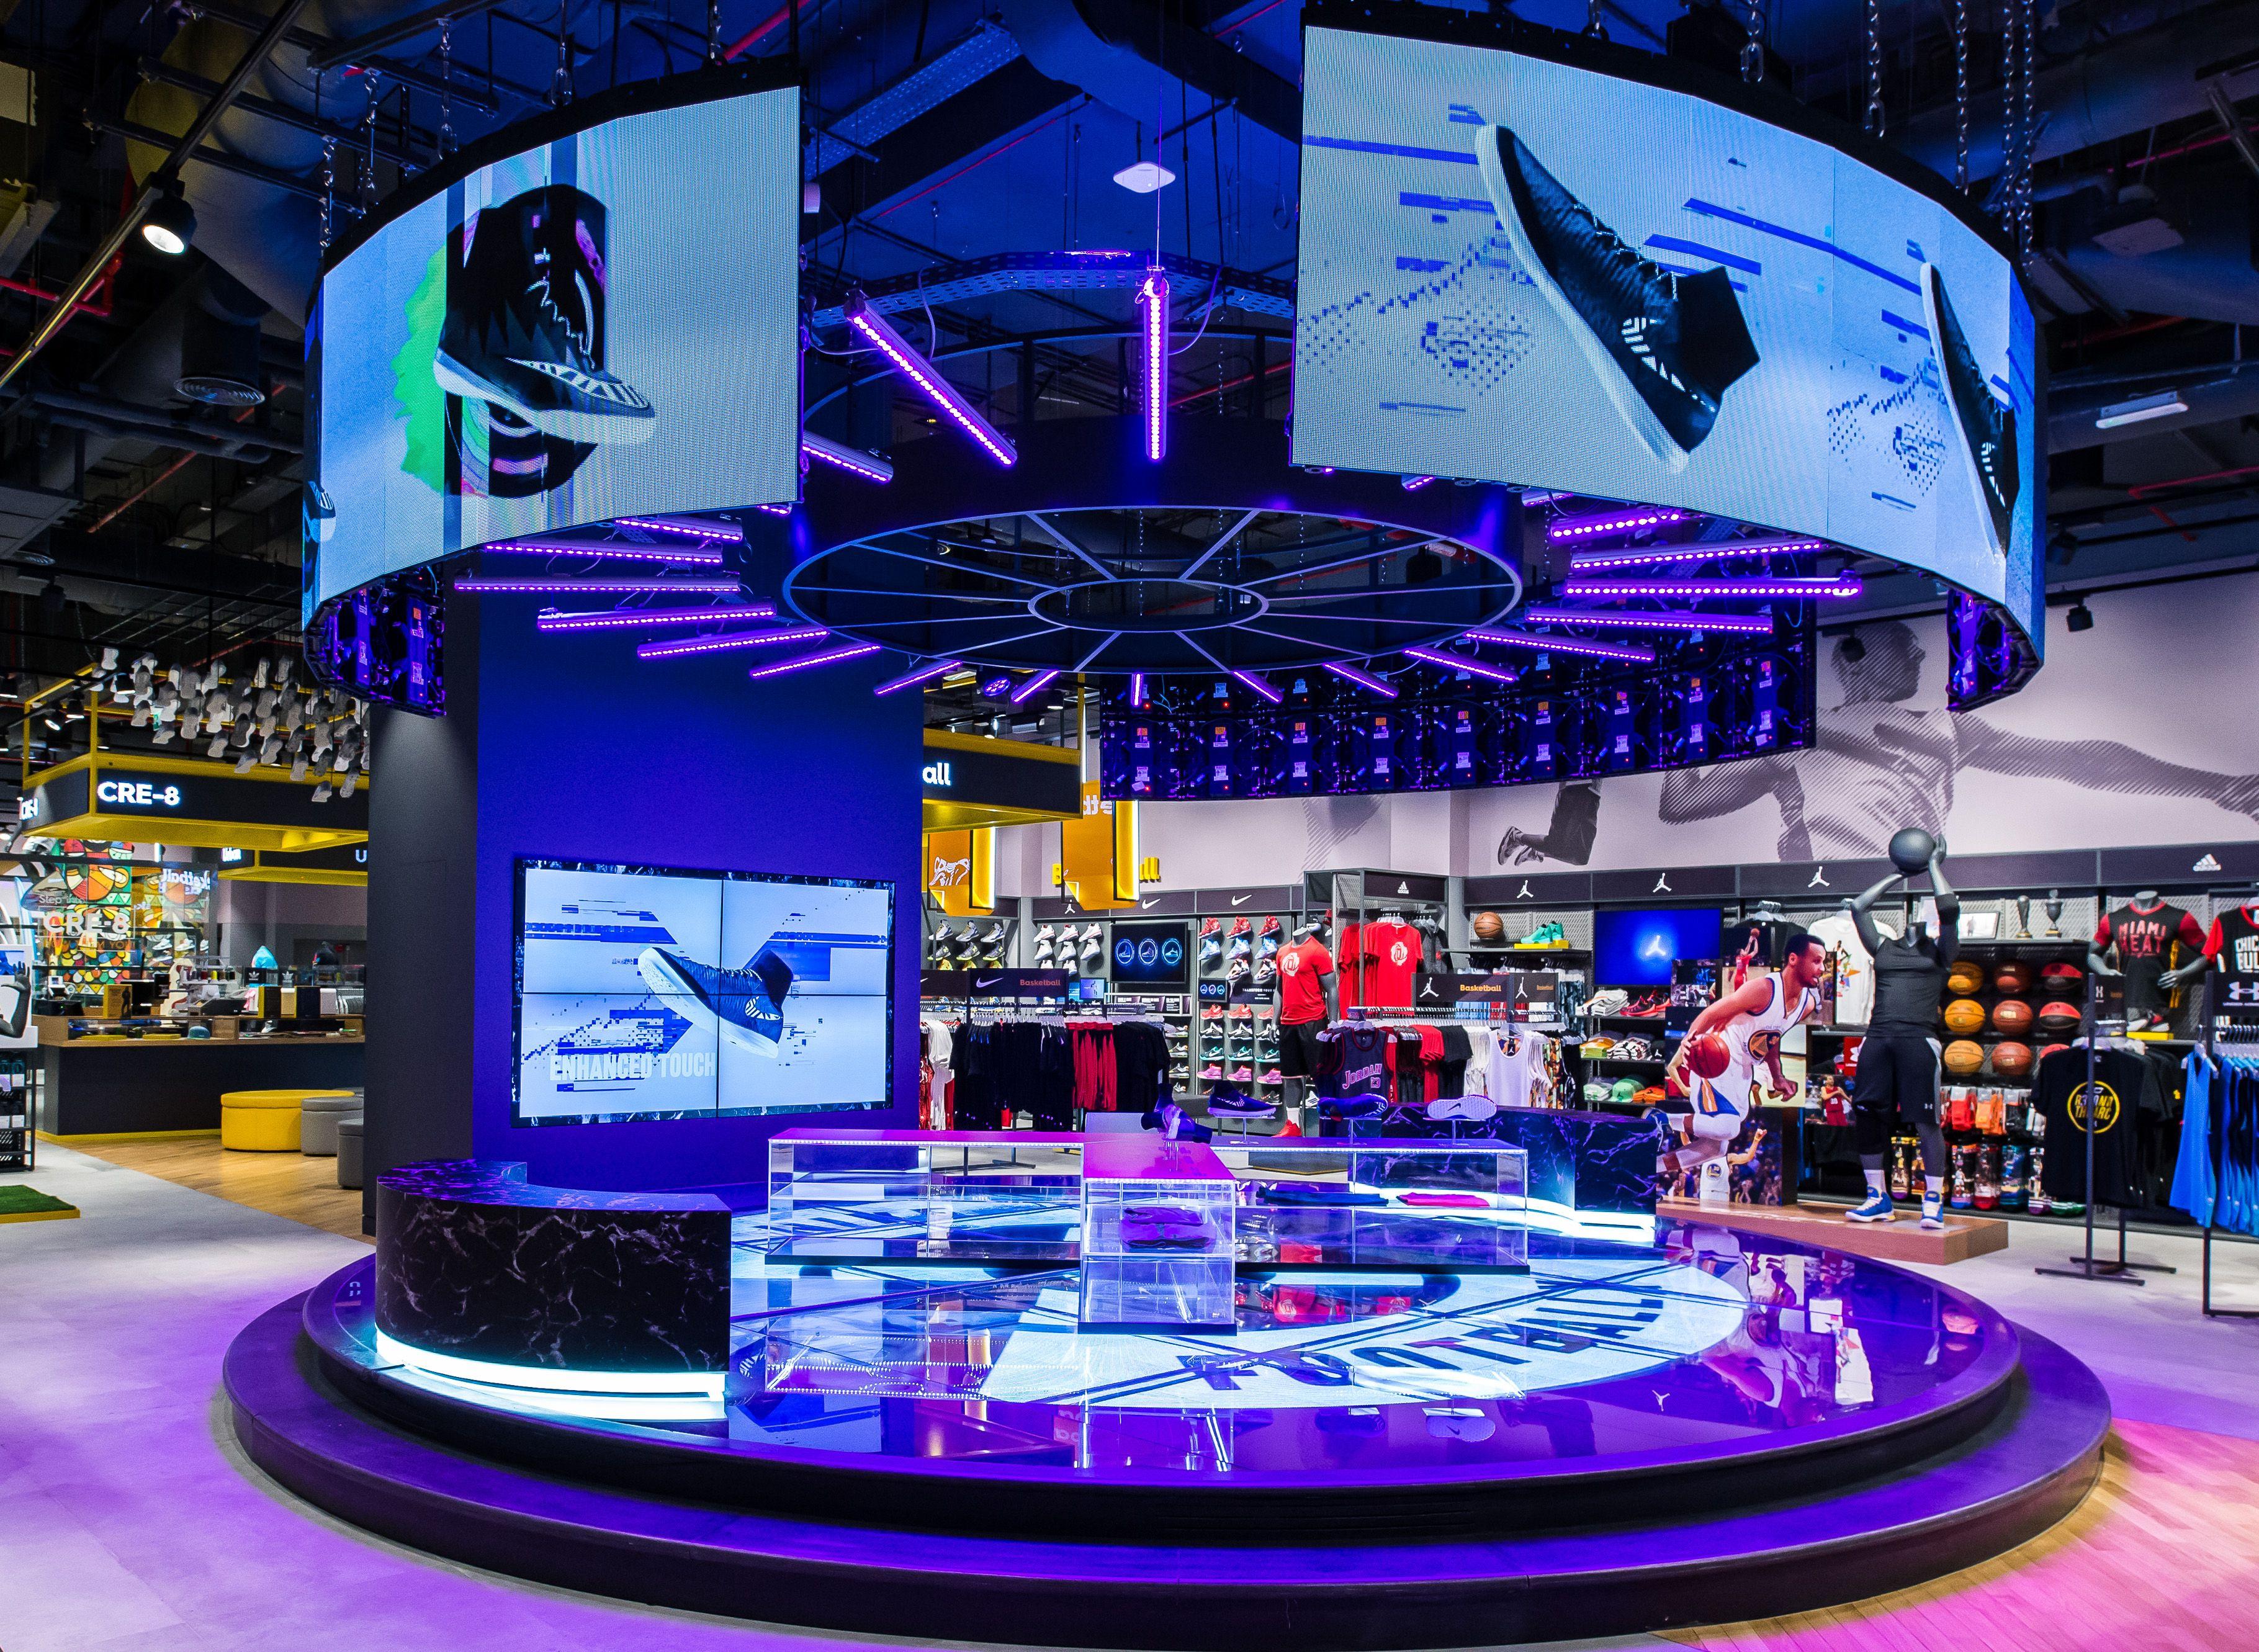 Sun & Sand Sports Store The Dubai Mall Central Event